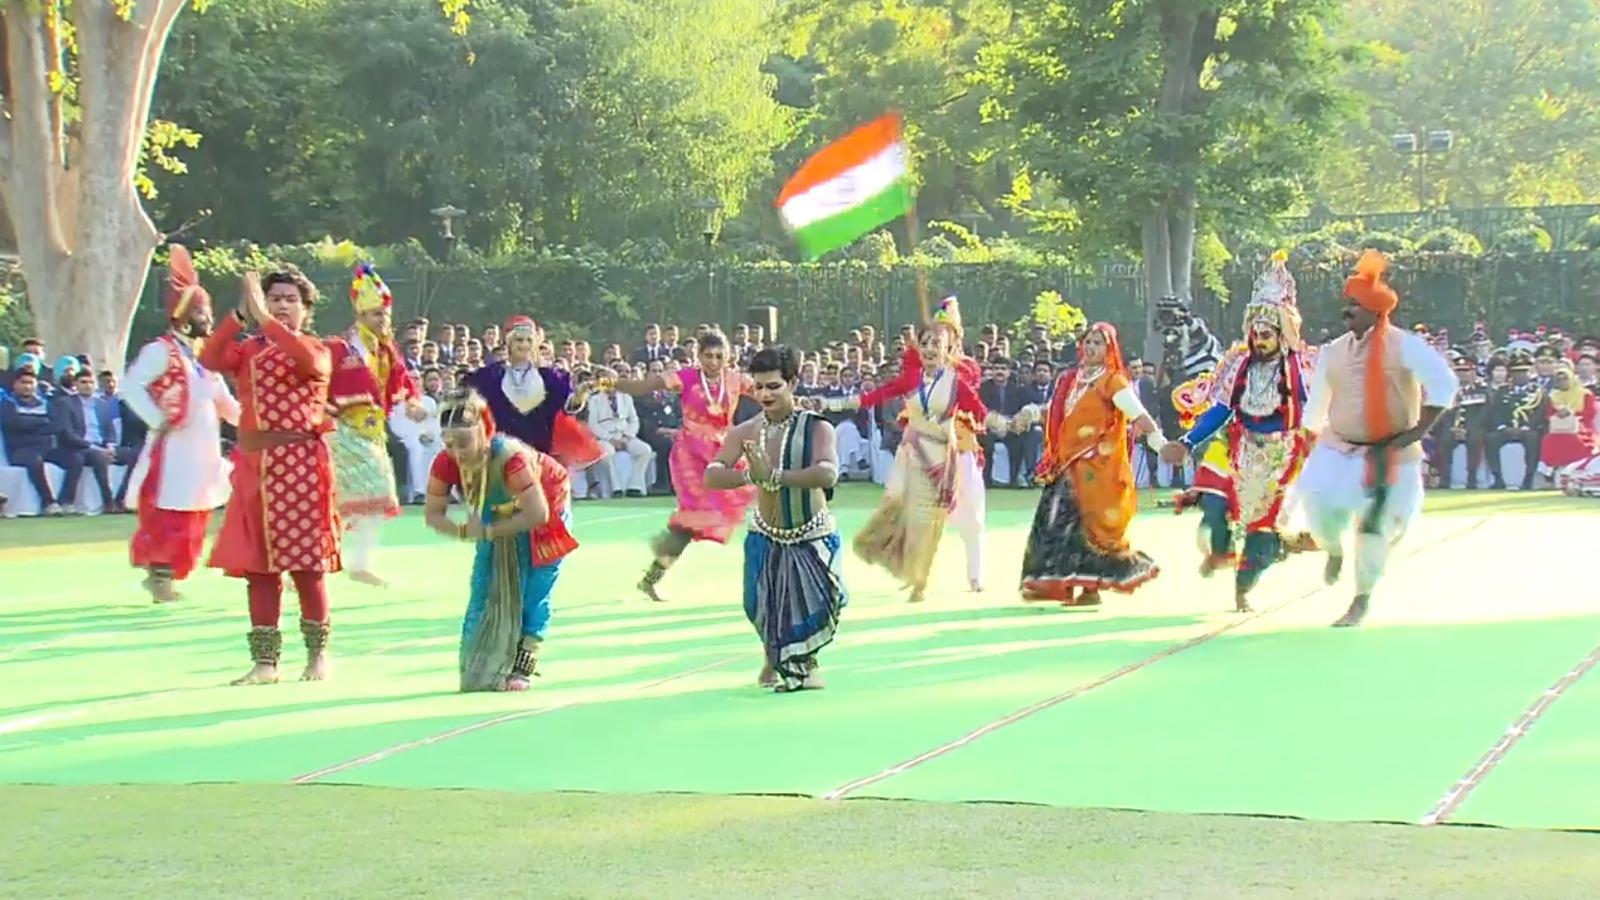 republic-day-artists-ncc-cadets-performing-at-parade-meet-pm-narendra-modi